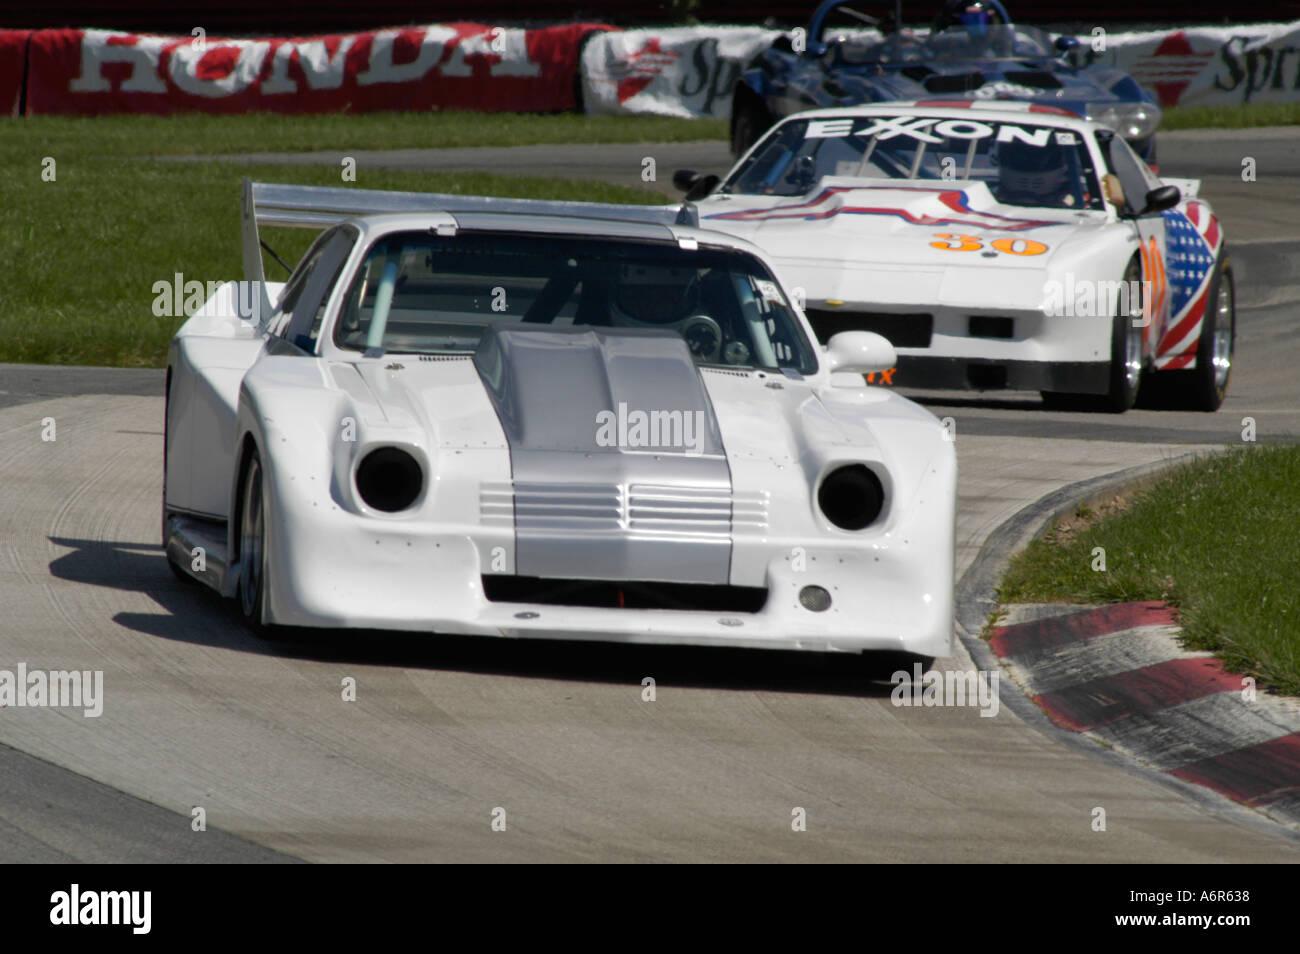 Dan Furey races his 1978 Chevrolet Vega at the SVRA Sprint Vintage ...